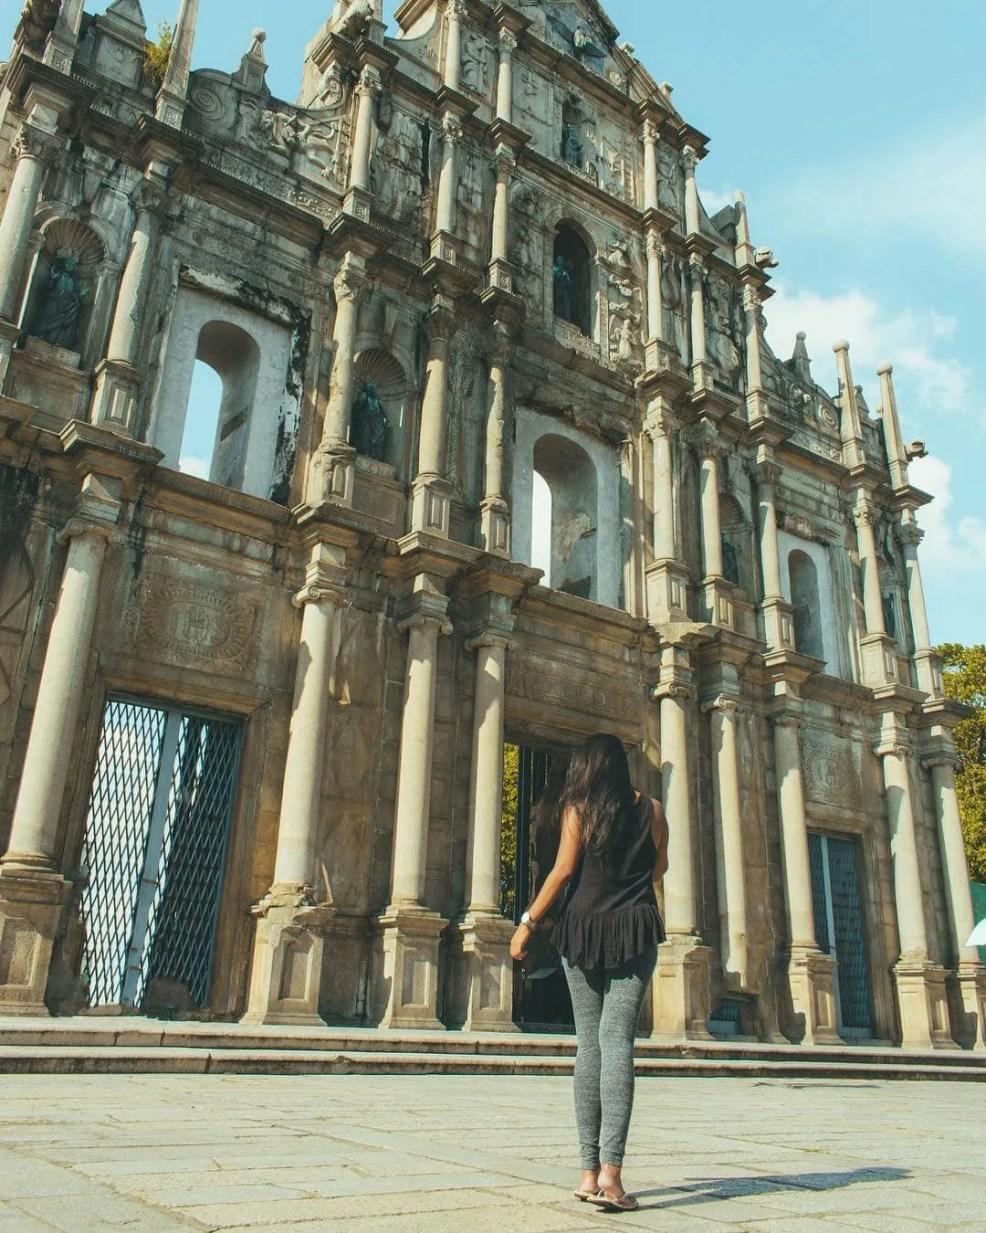 things to do in Macau, macau tourist spots, where to stay in Macau, Macau travel guide, hong kong to Macau ferry, macau currency, macau weather forescast,